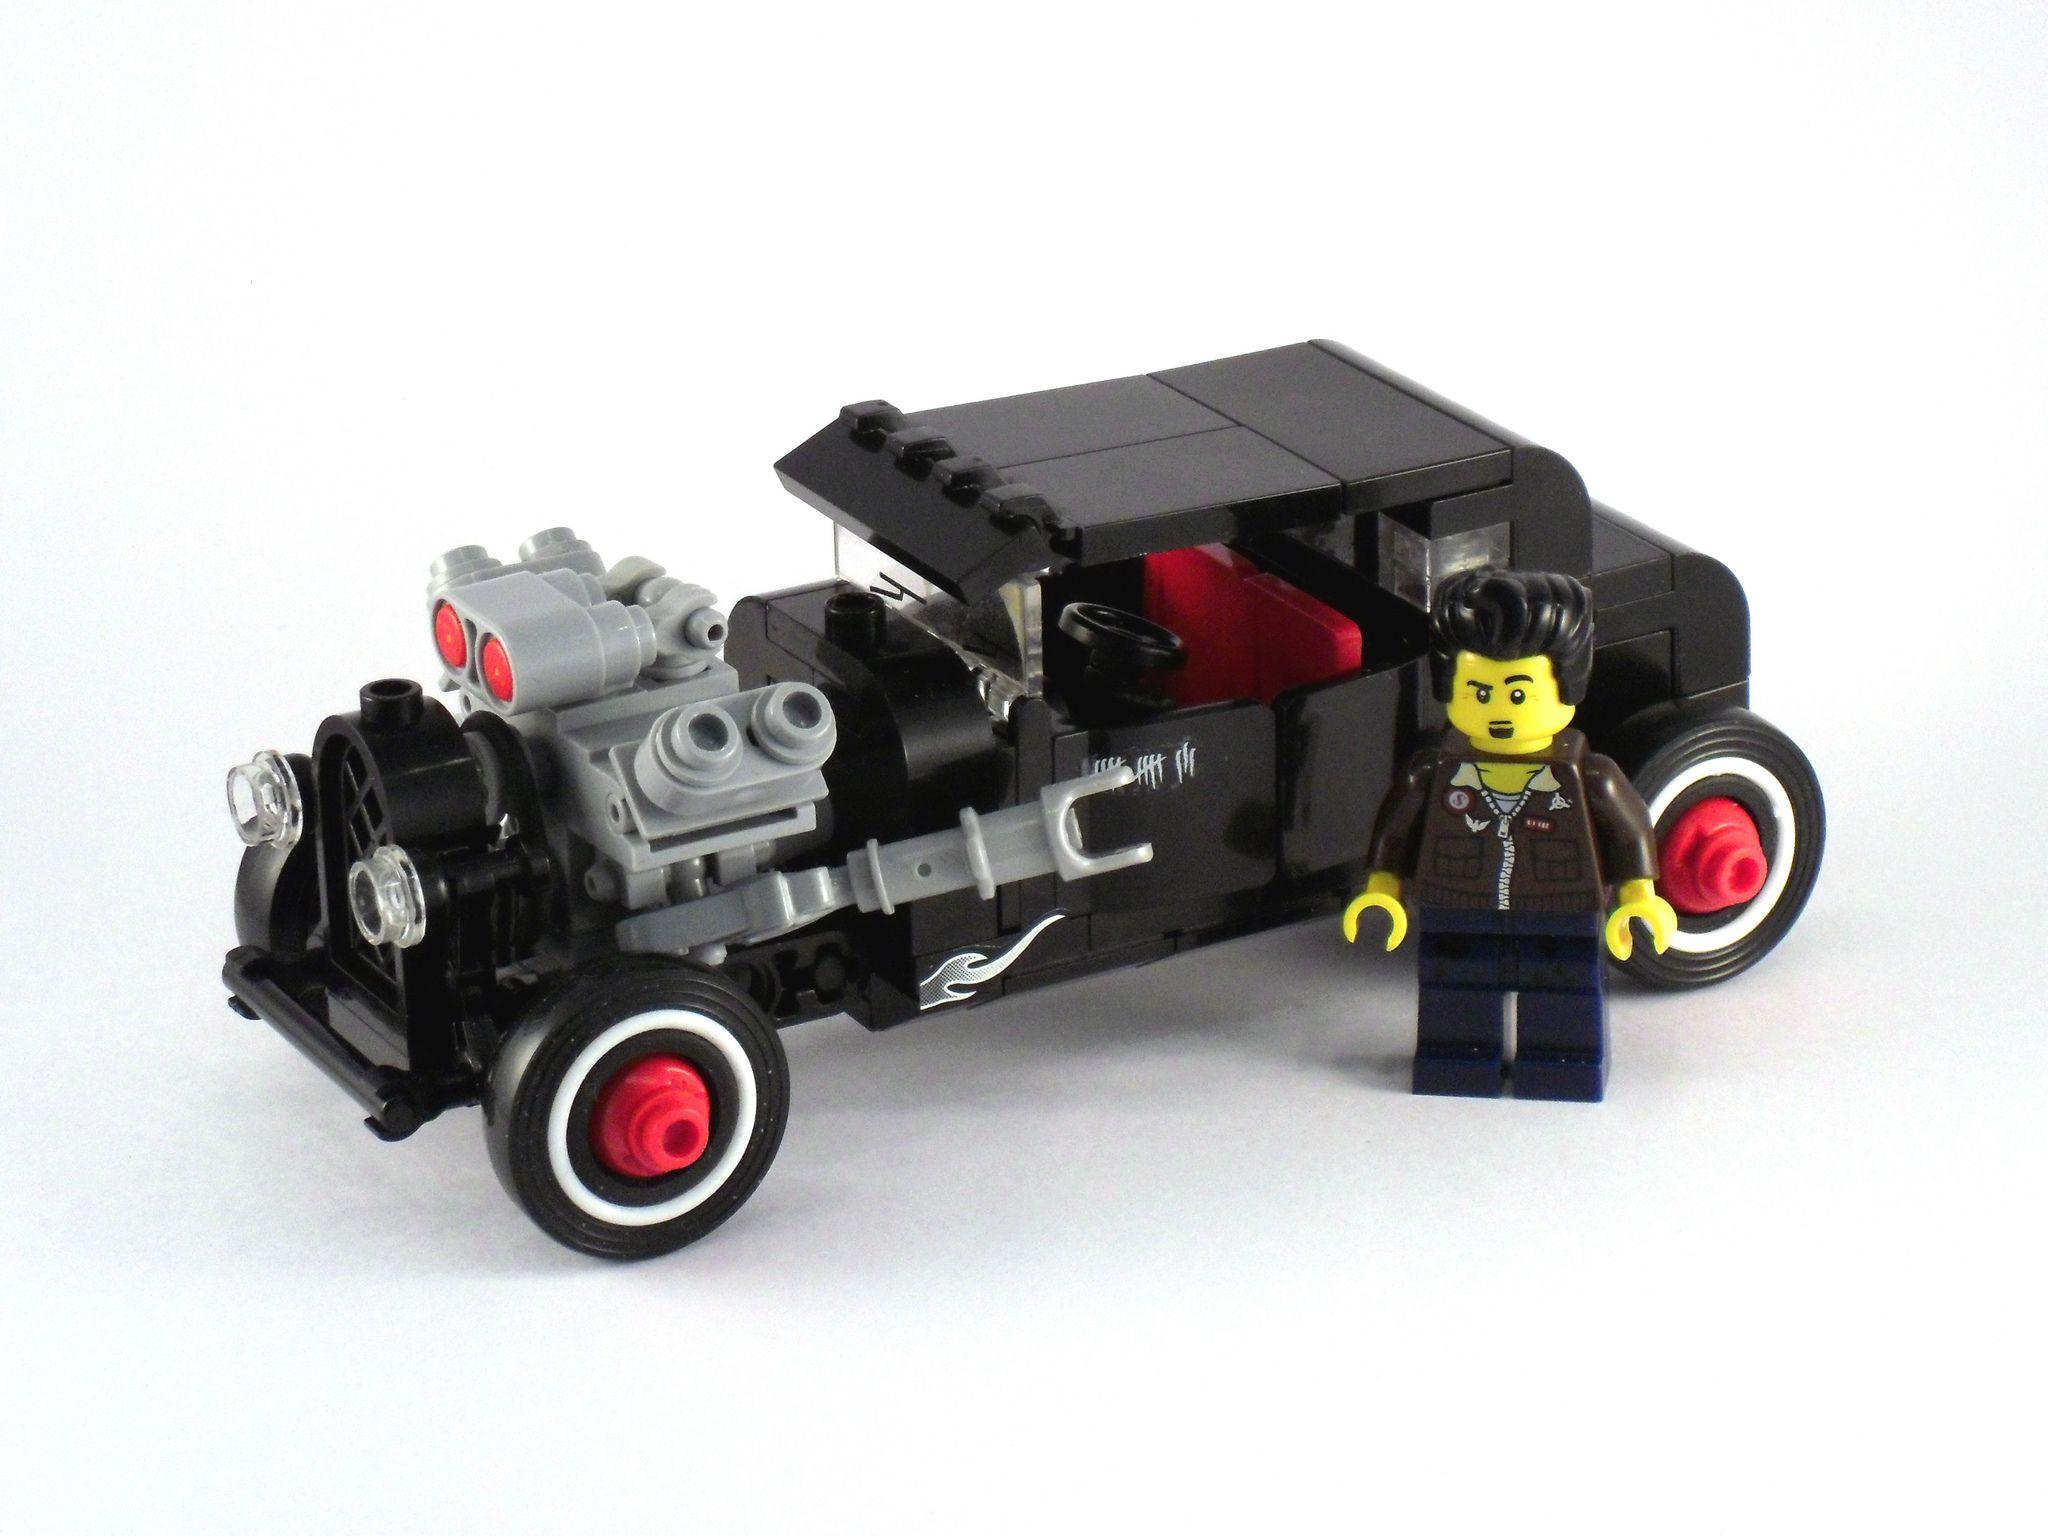 Roadkill Hot Rod lego vehicles Pinterest